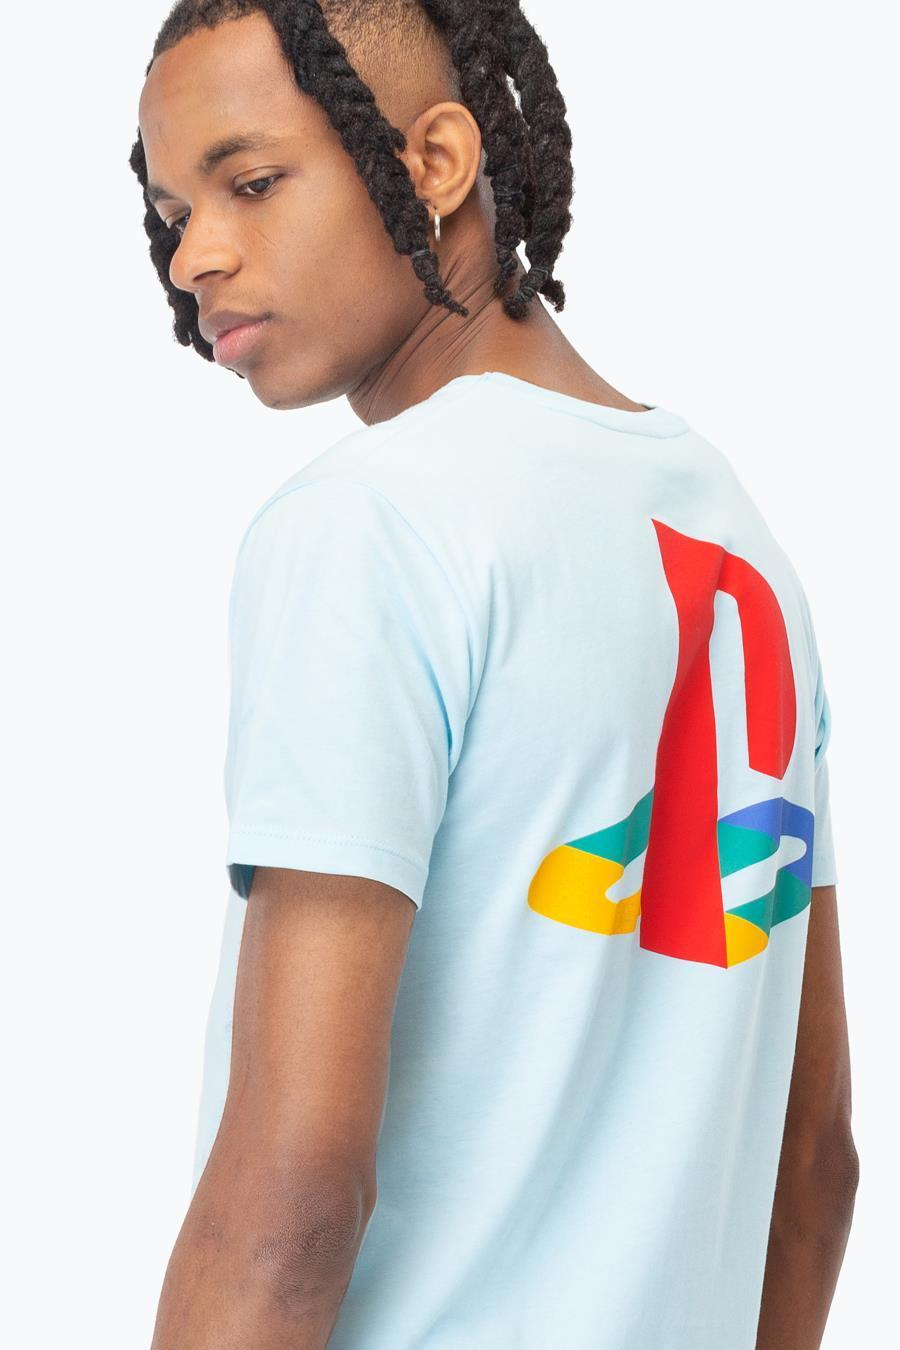 Just Hype: PlayStation Blue Crest Mens T-Shirt - Large image